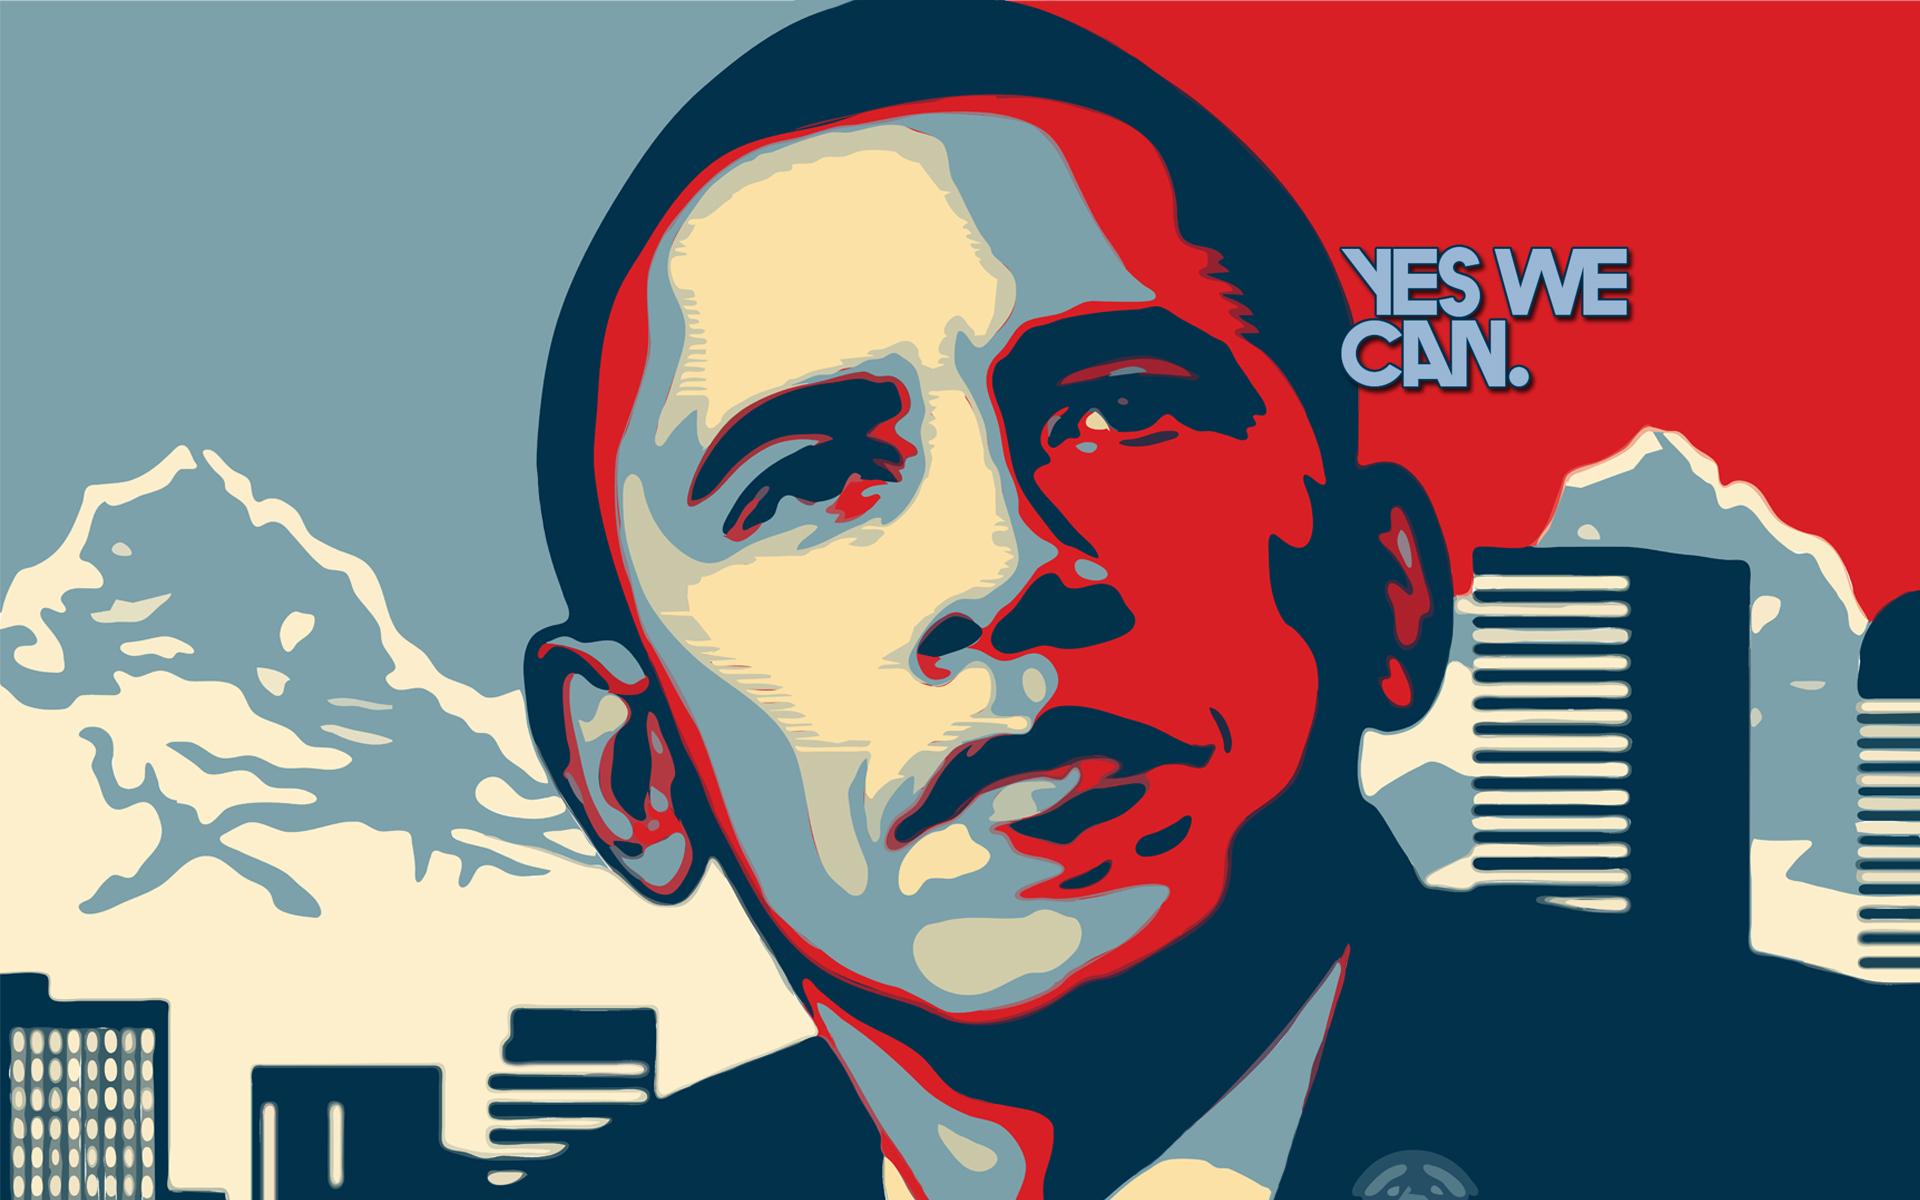 Obama Wallpaper ImageBankbiz 1920x1200